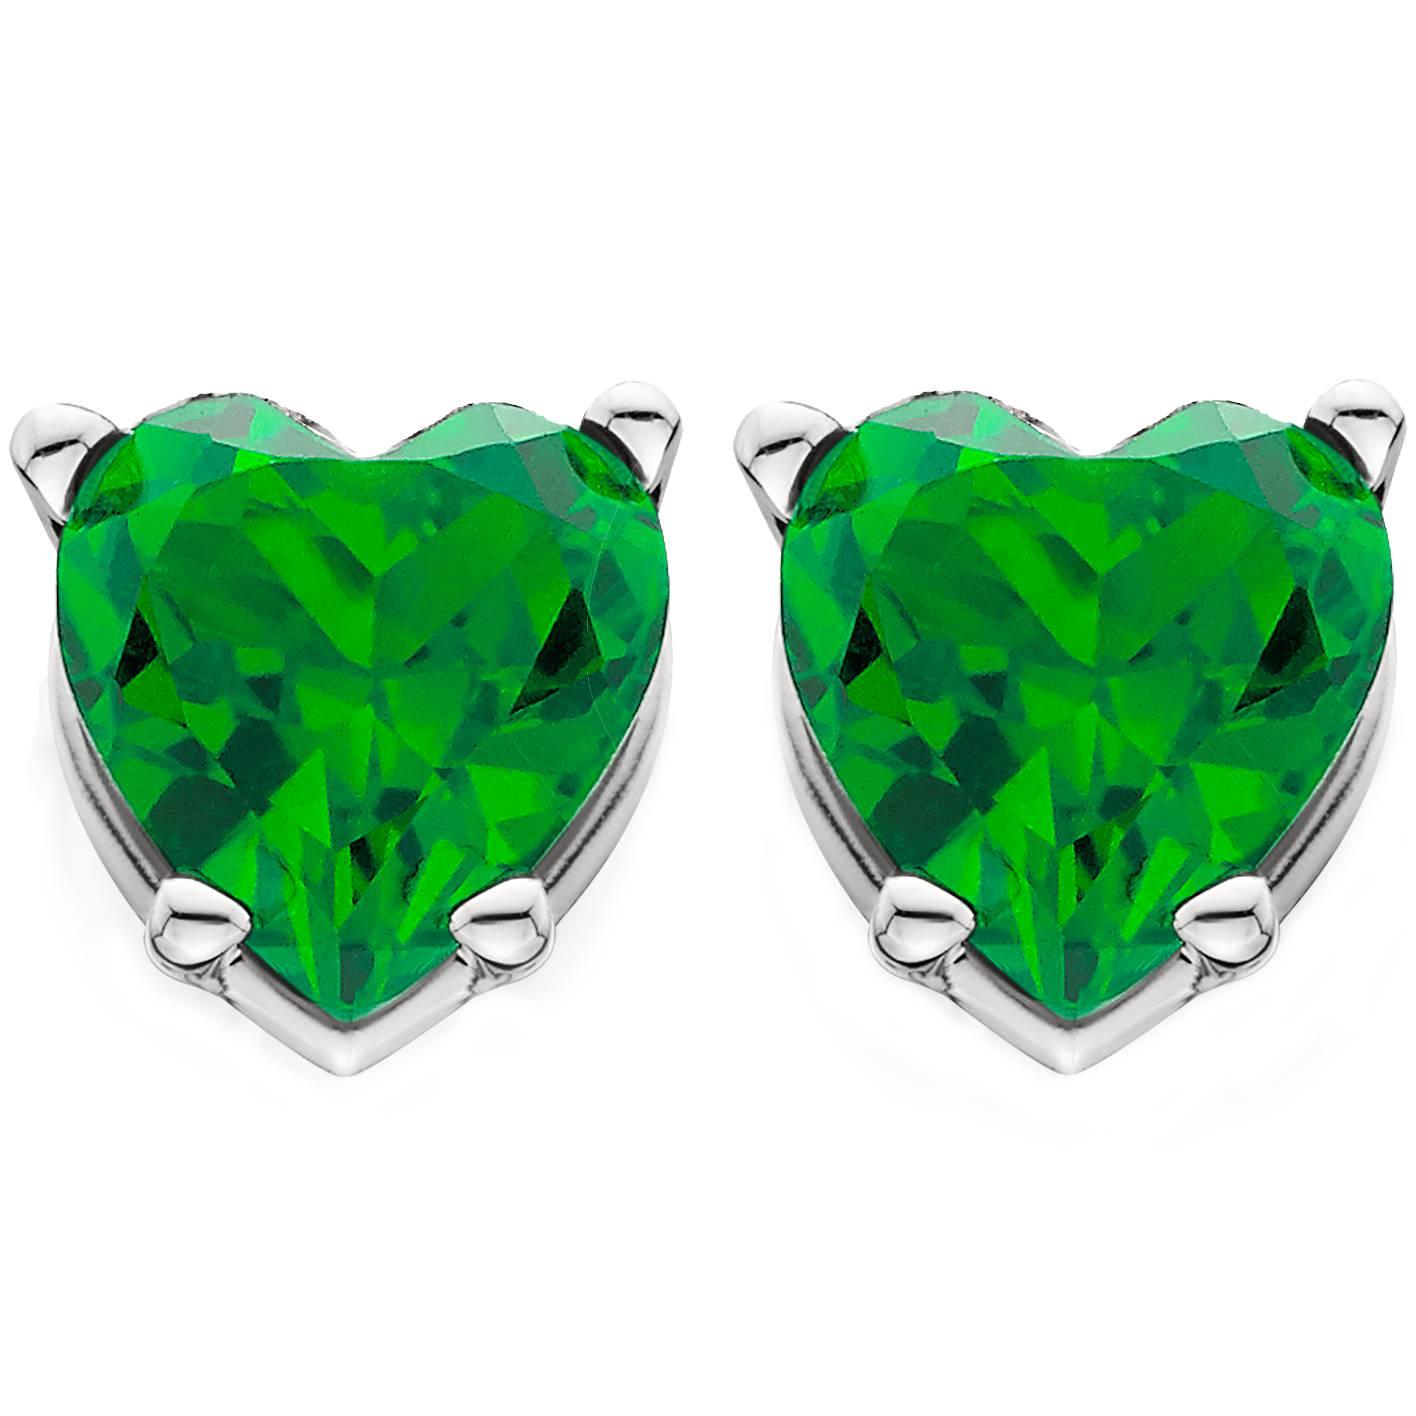 1ct heart shape simulated emerald studs earrings 14k white